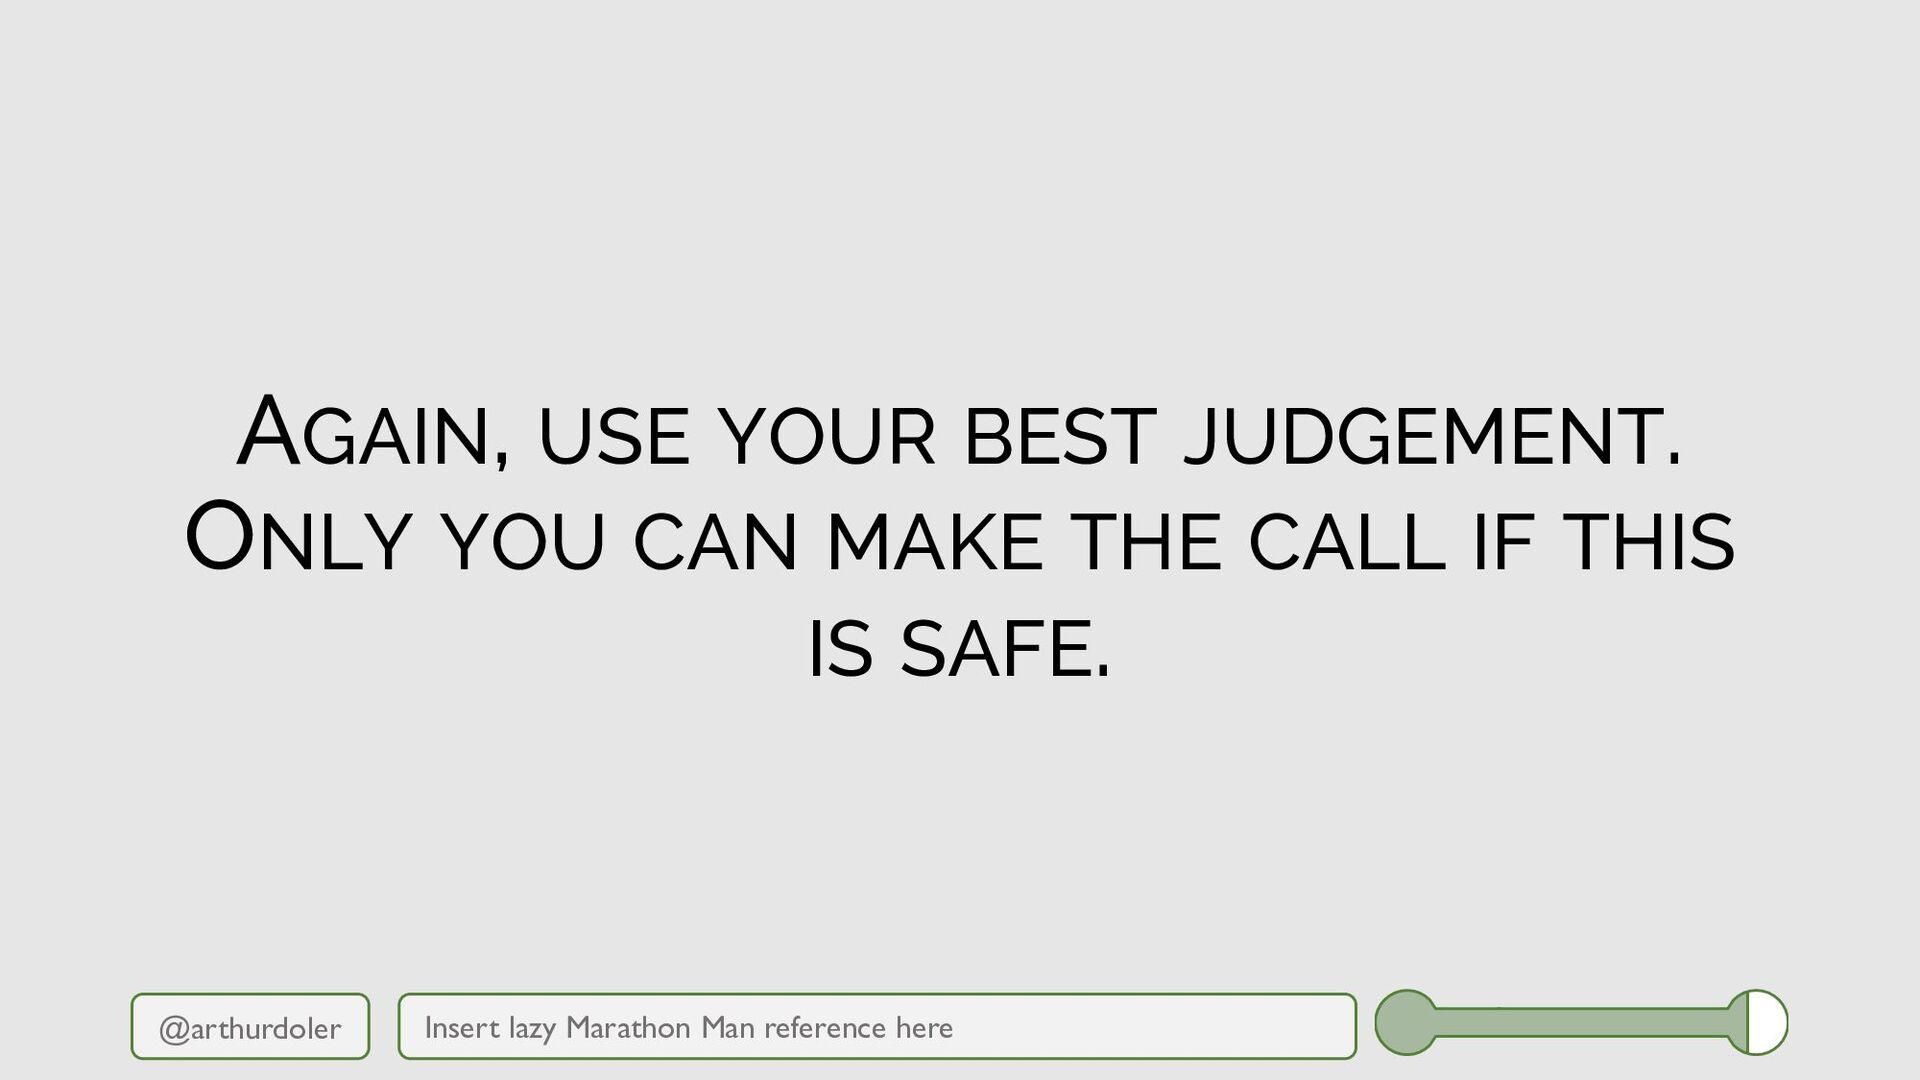 @arthurdoler AGAIN, USE YOUR BEST JUDGEMENT. ON...